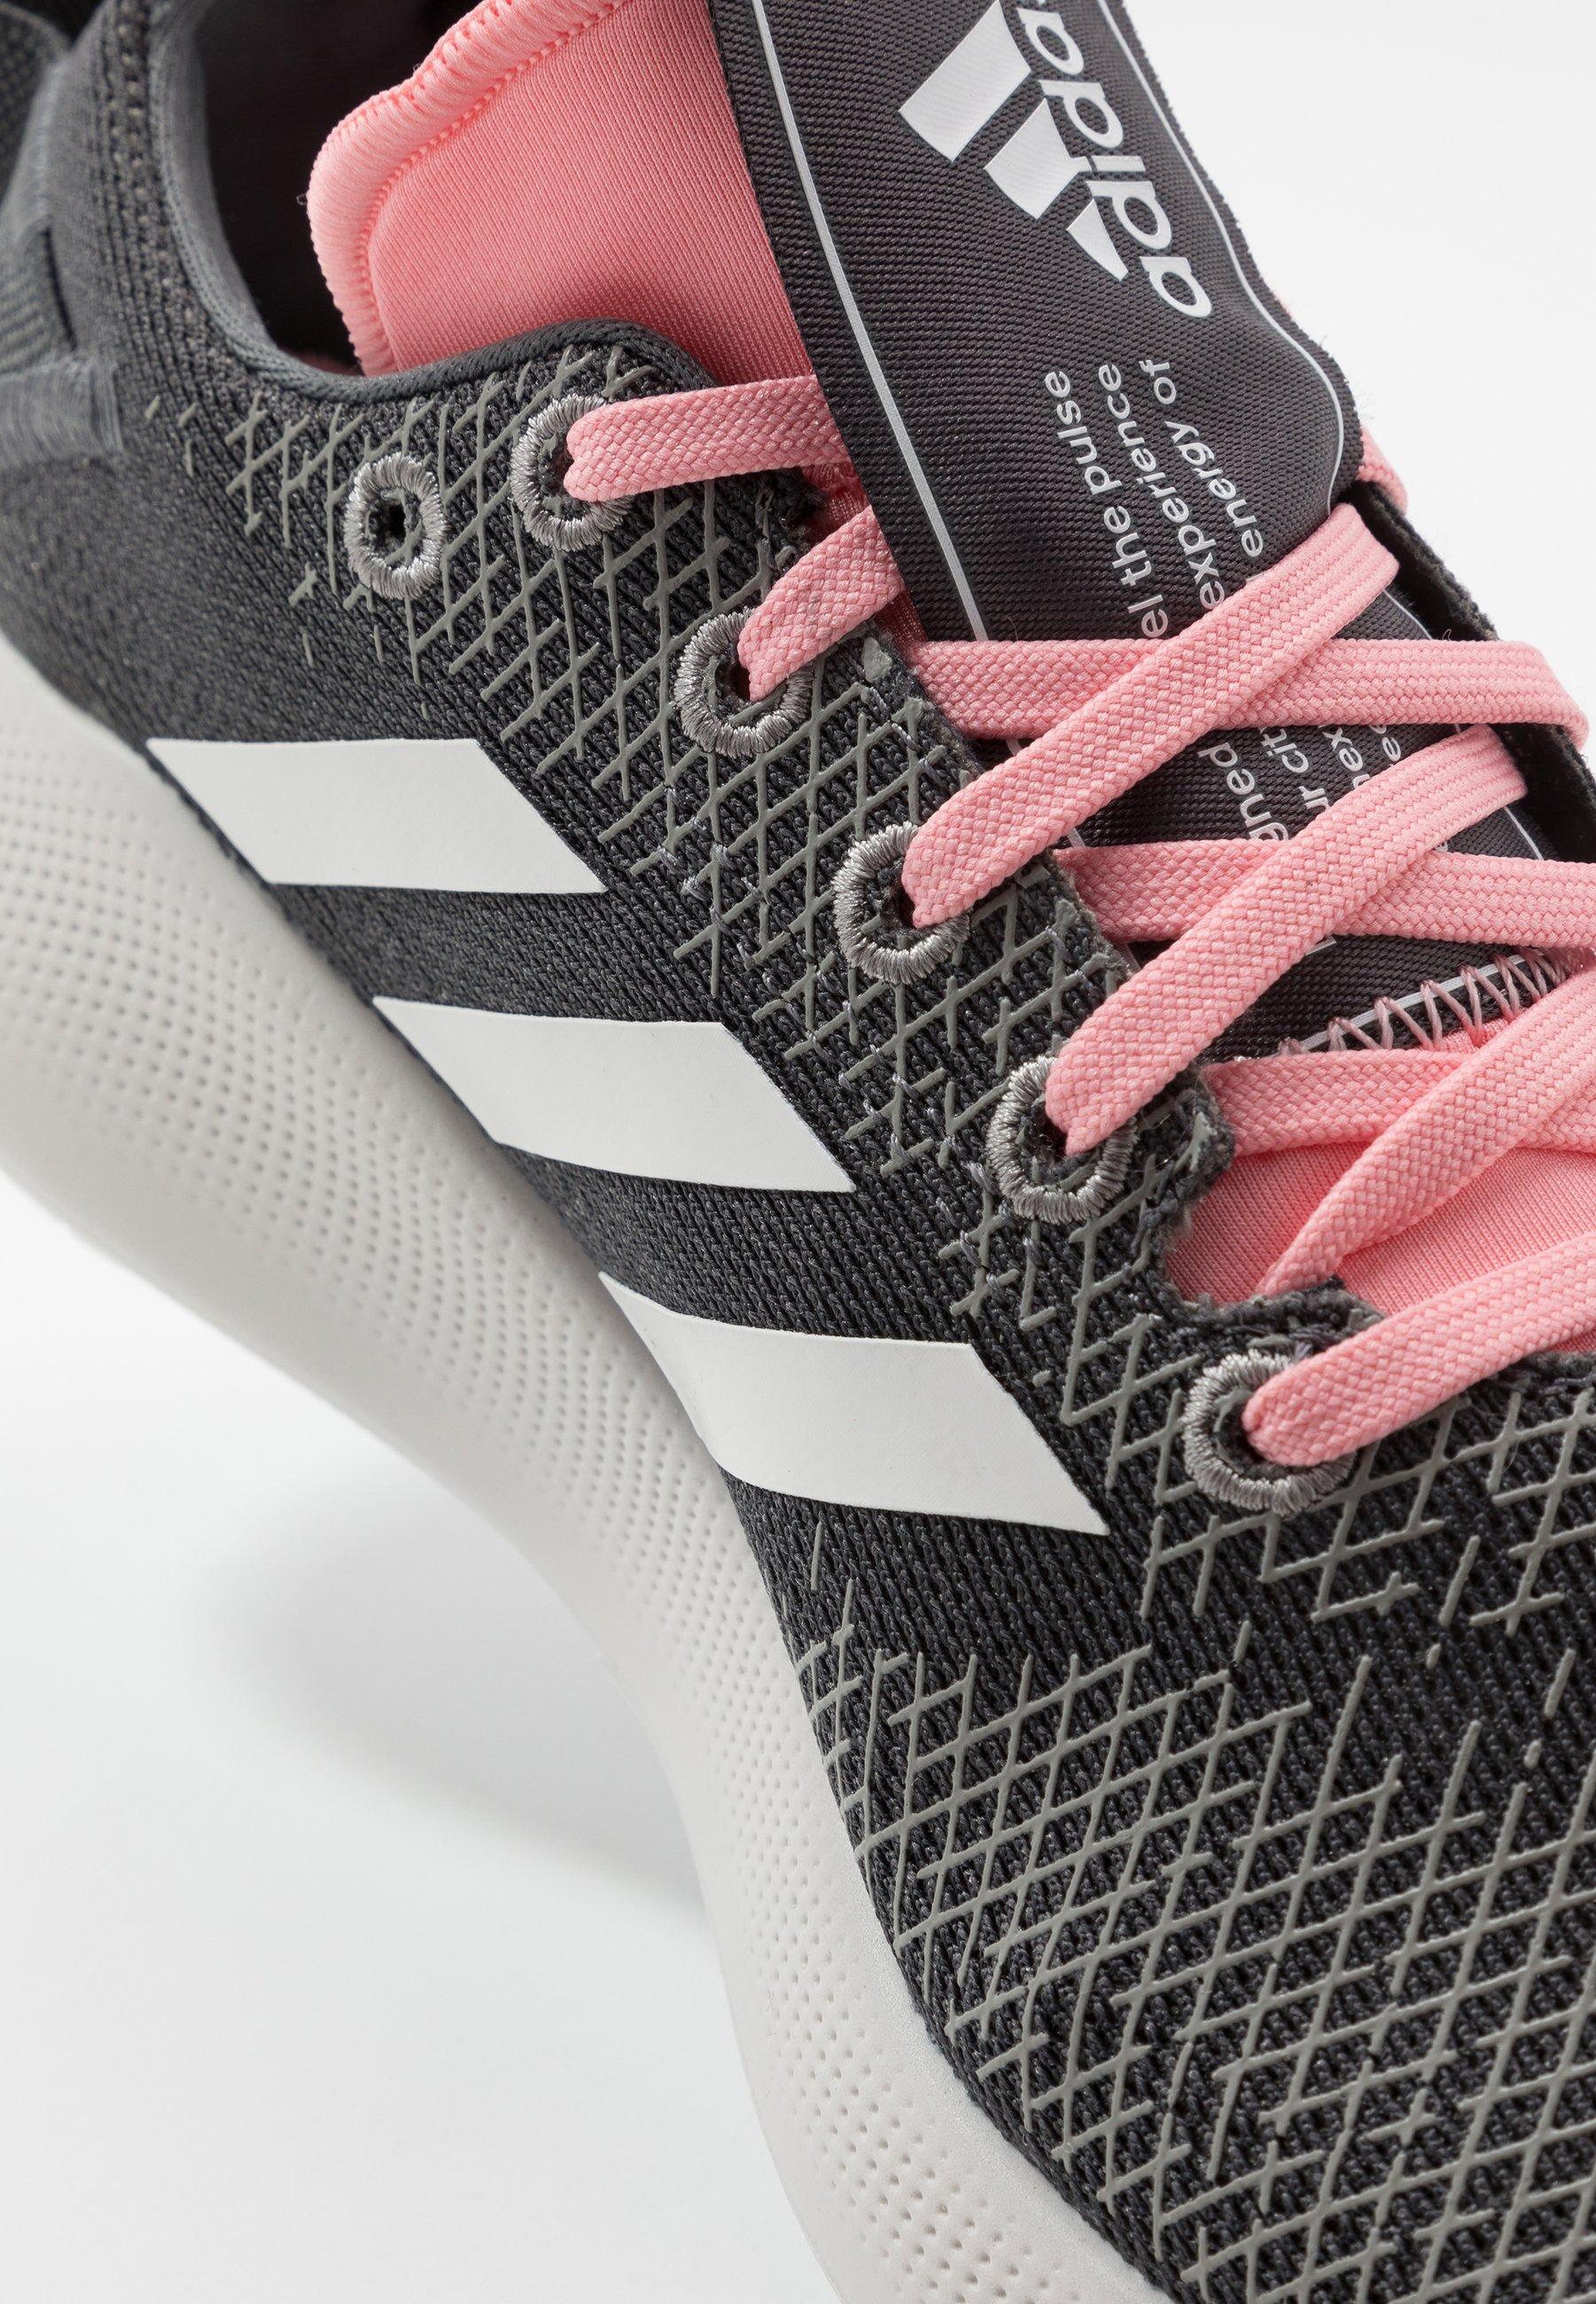 SENSEBOUNCE + STREET Neutrala löparskor grey fivevrystal whiteglow pink